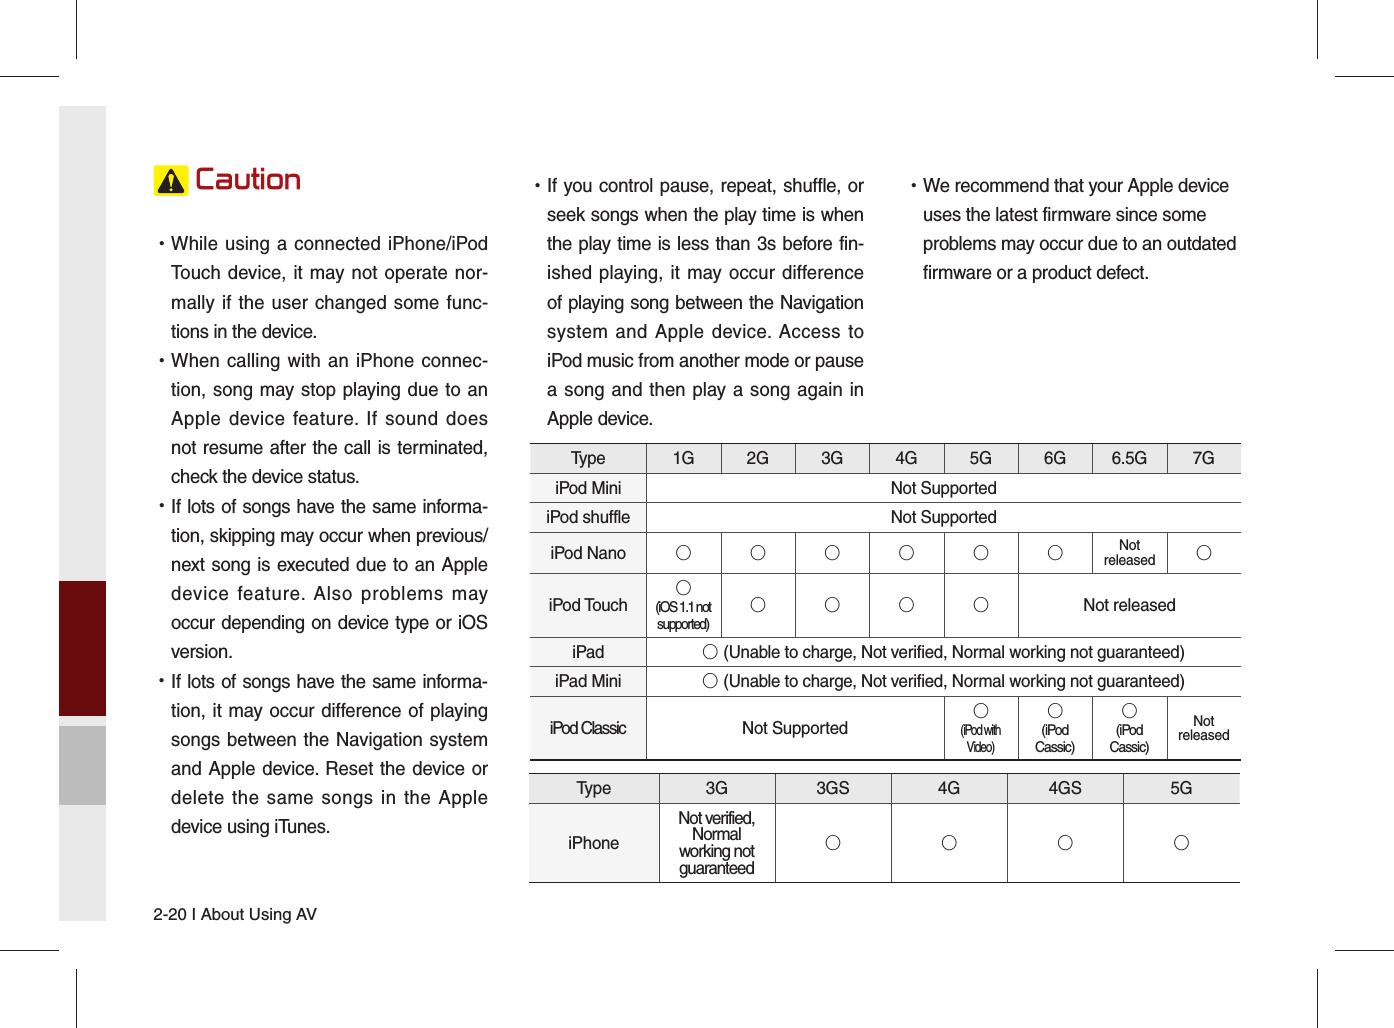 hyundai mobis avc31b2an digital car avn system user manual